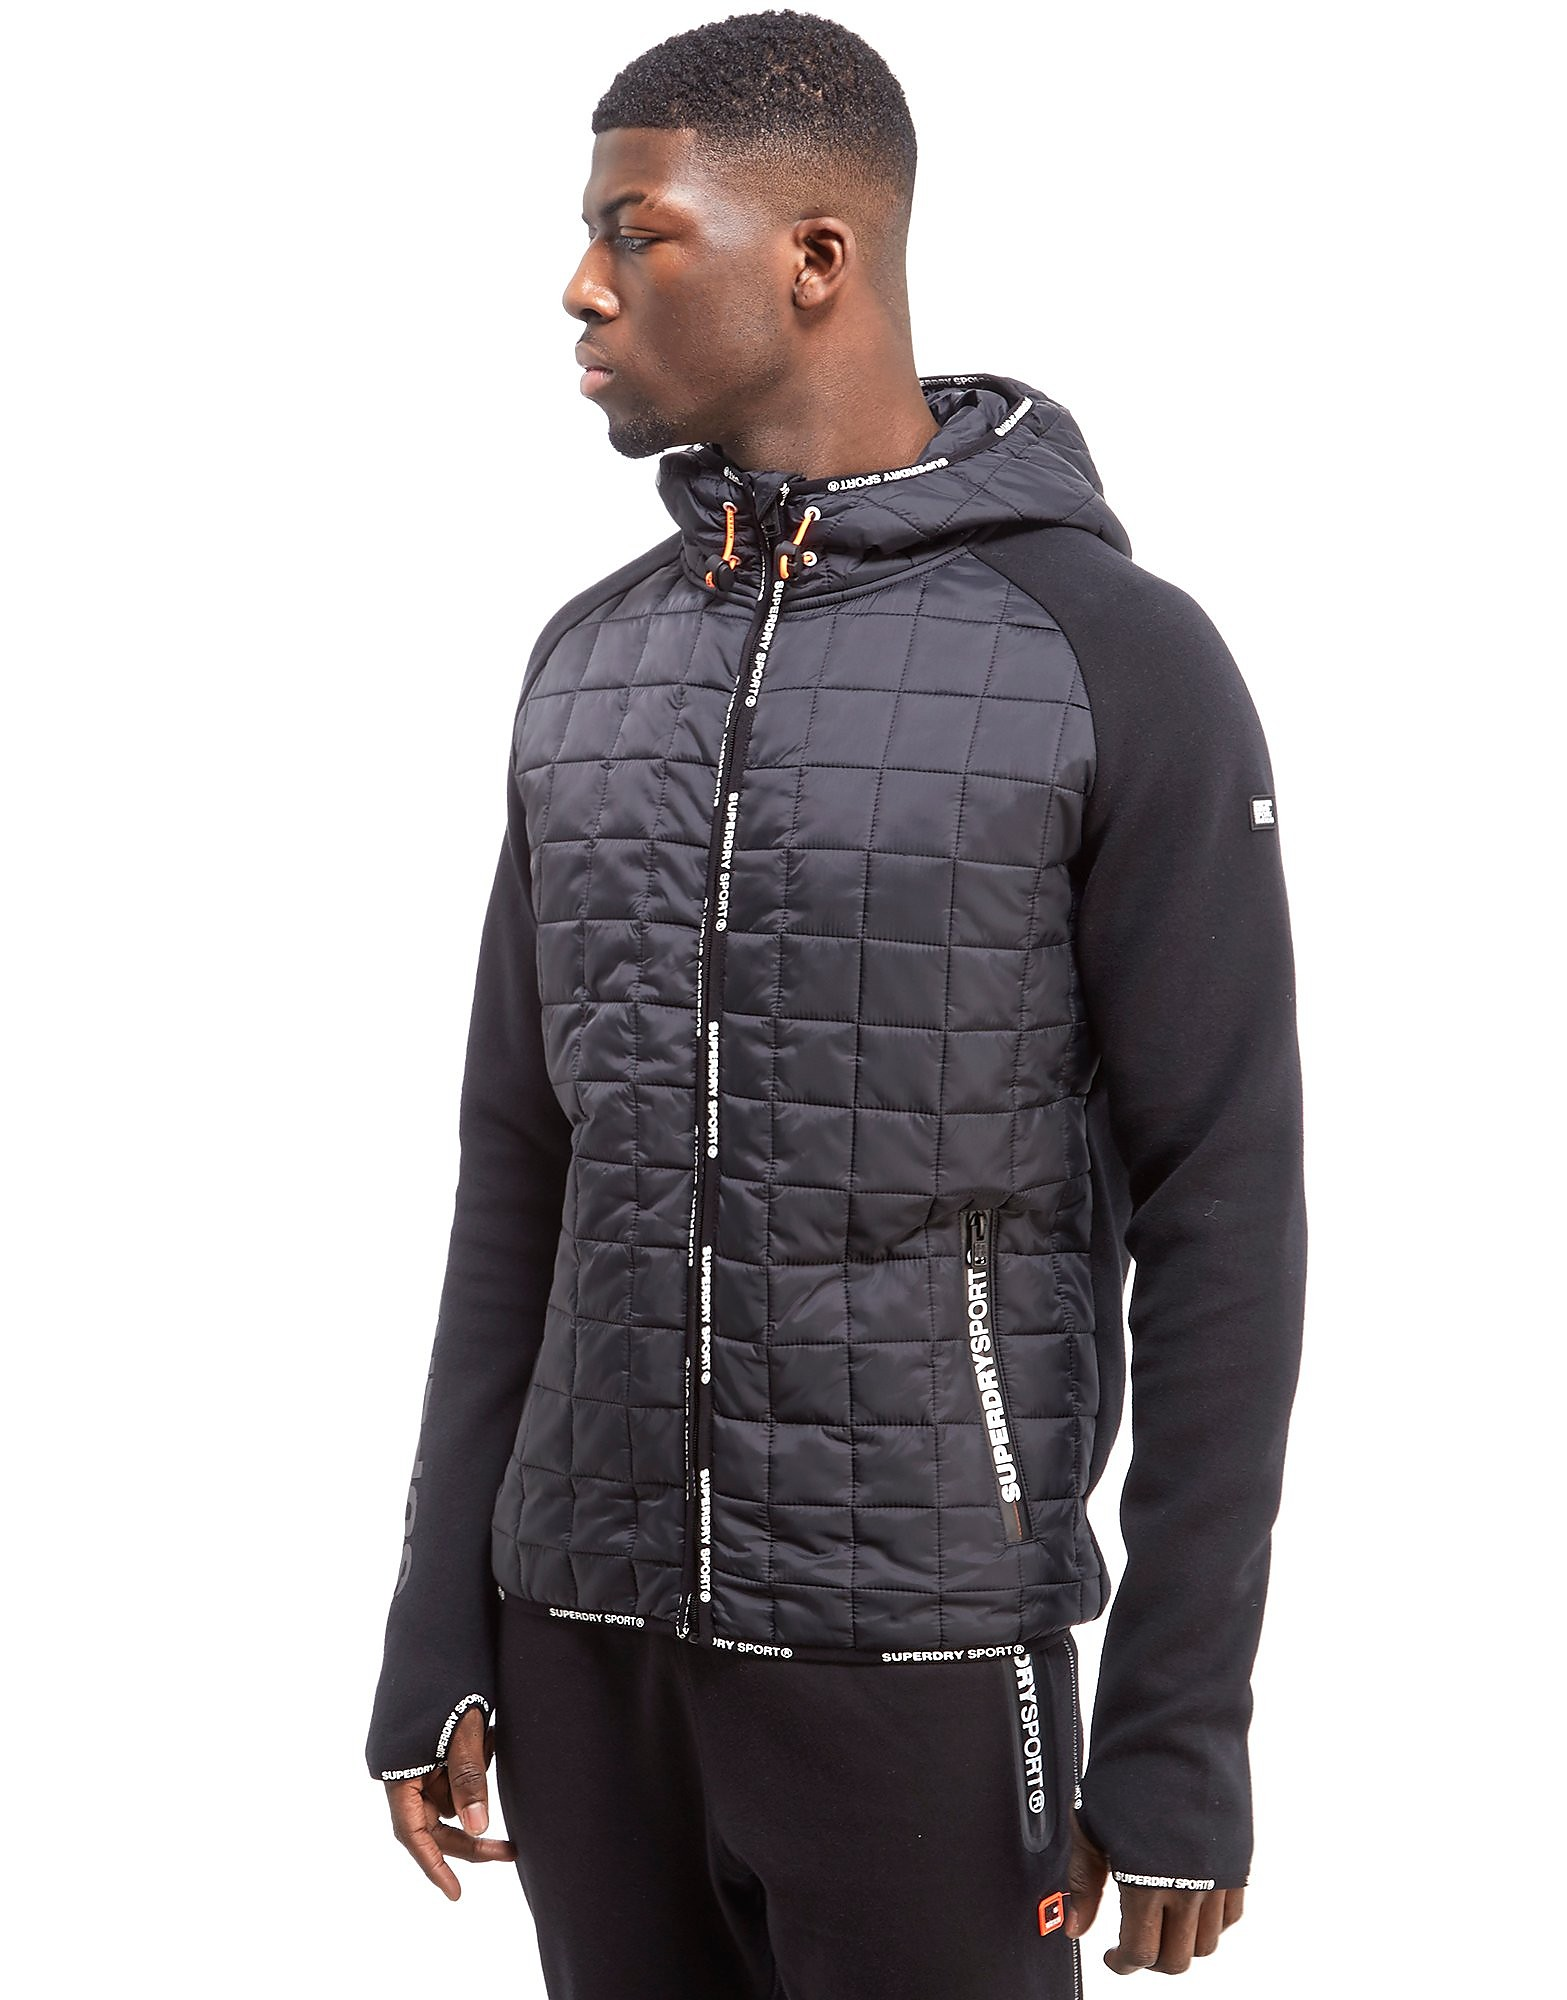 Superdry Gym Tech Hybrid Zip Hooded Jacket